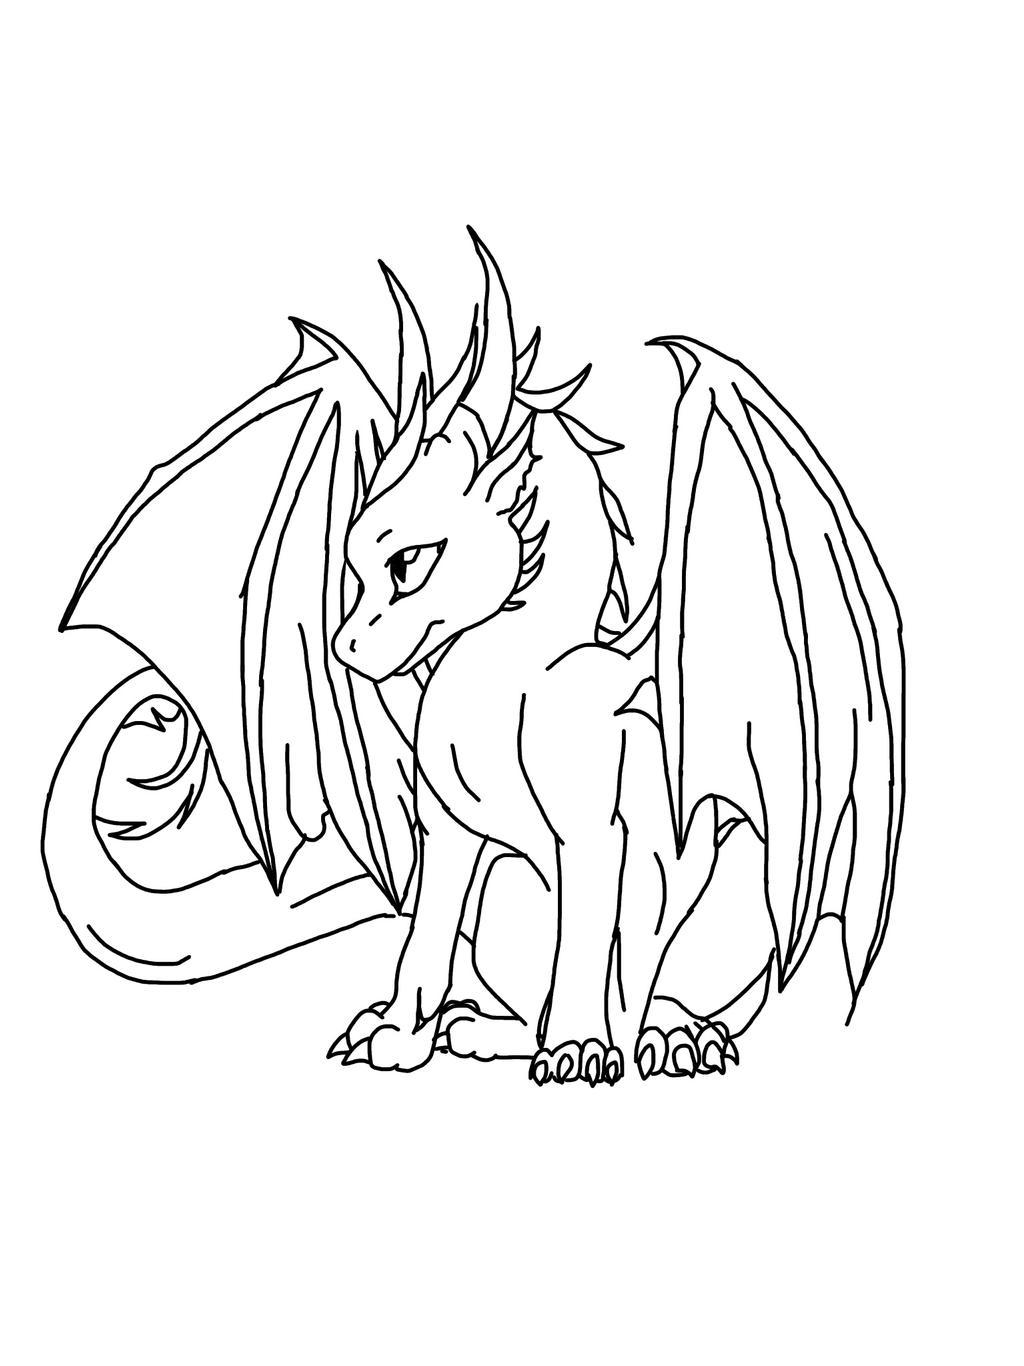 Cute Dragon ^_^ by WolfieTheAlpha on DeviantArt